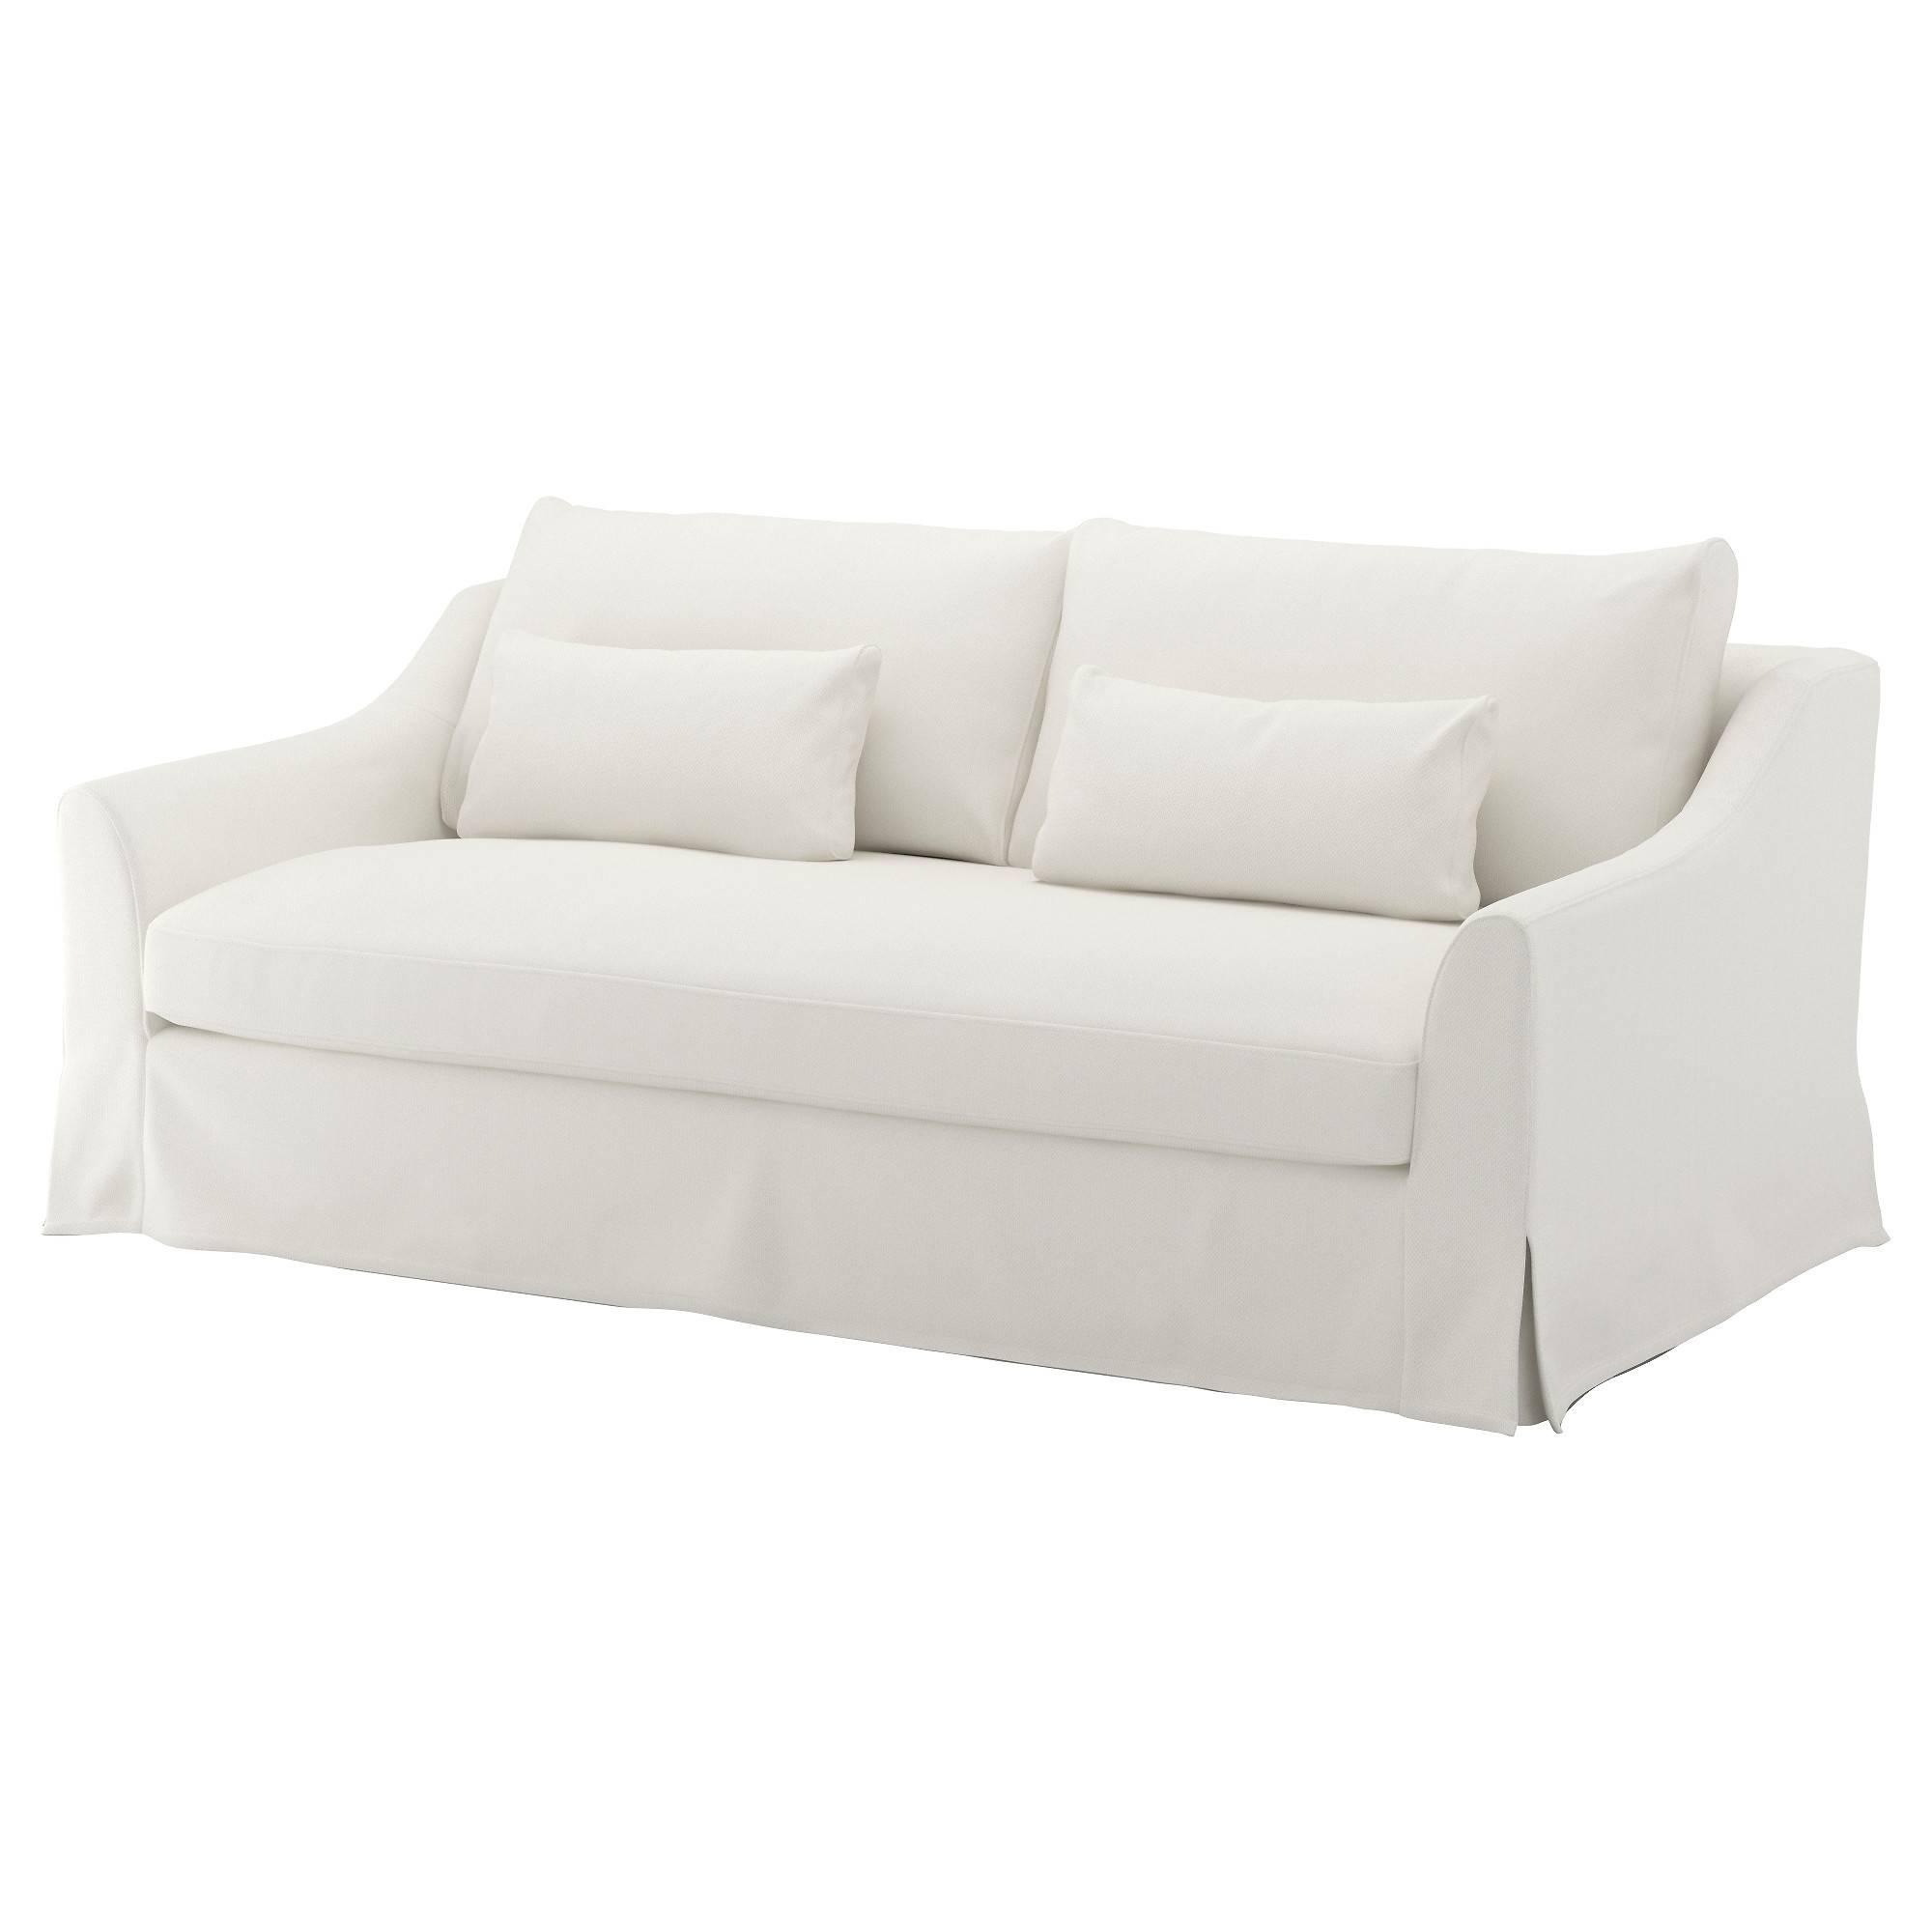 Fabric Sofas - Modern & Contemporary - Ikea regarding White Fabric Sofas (Image 12 of 30)